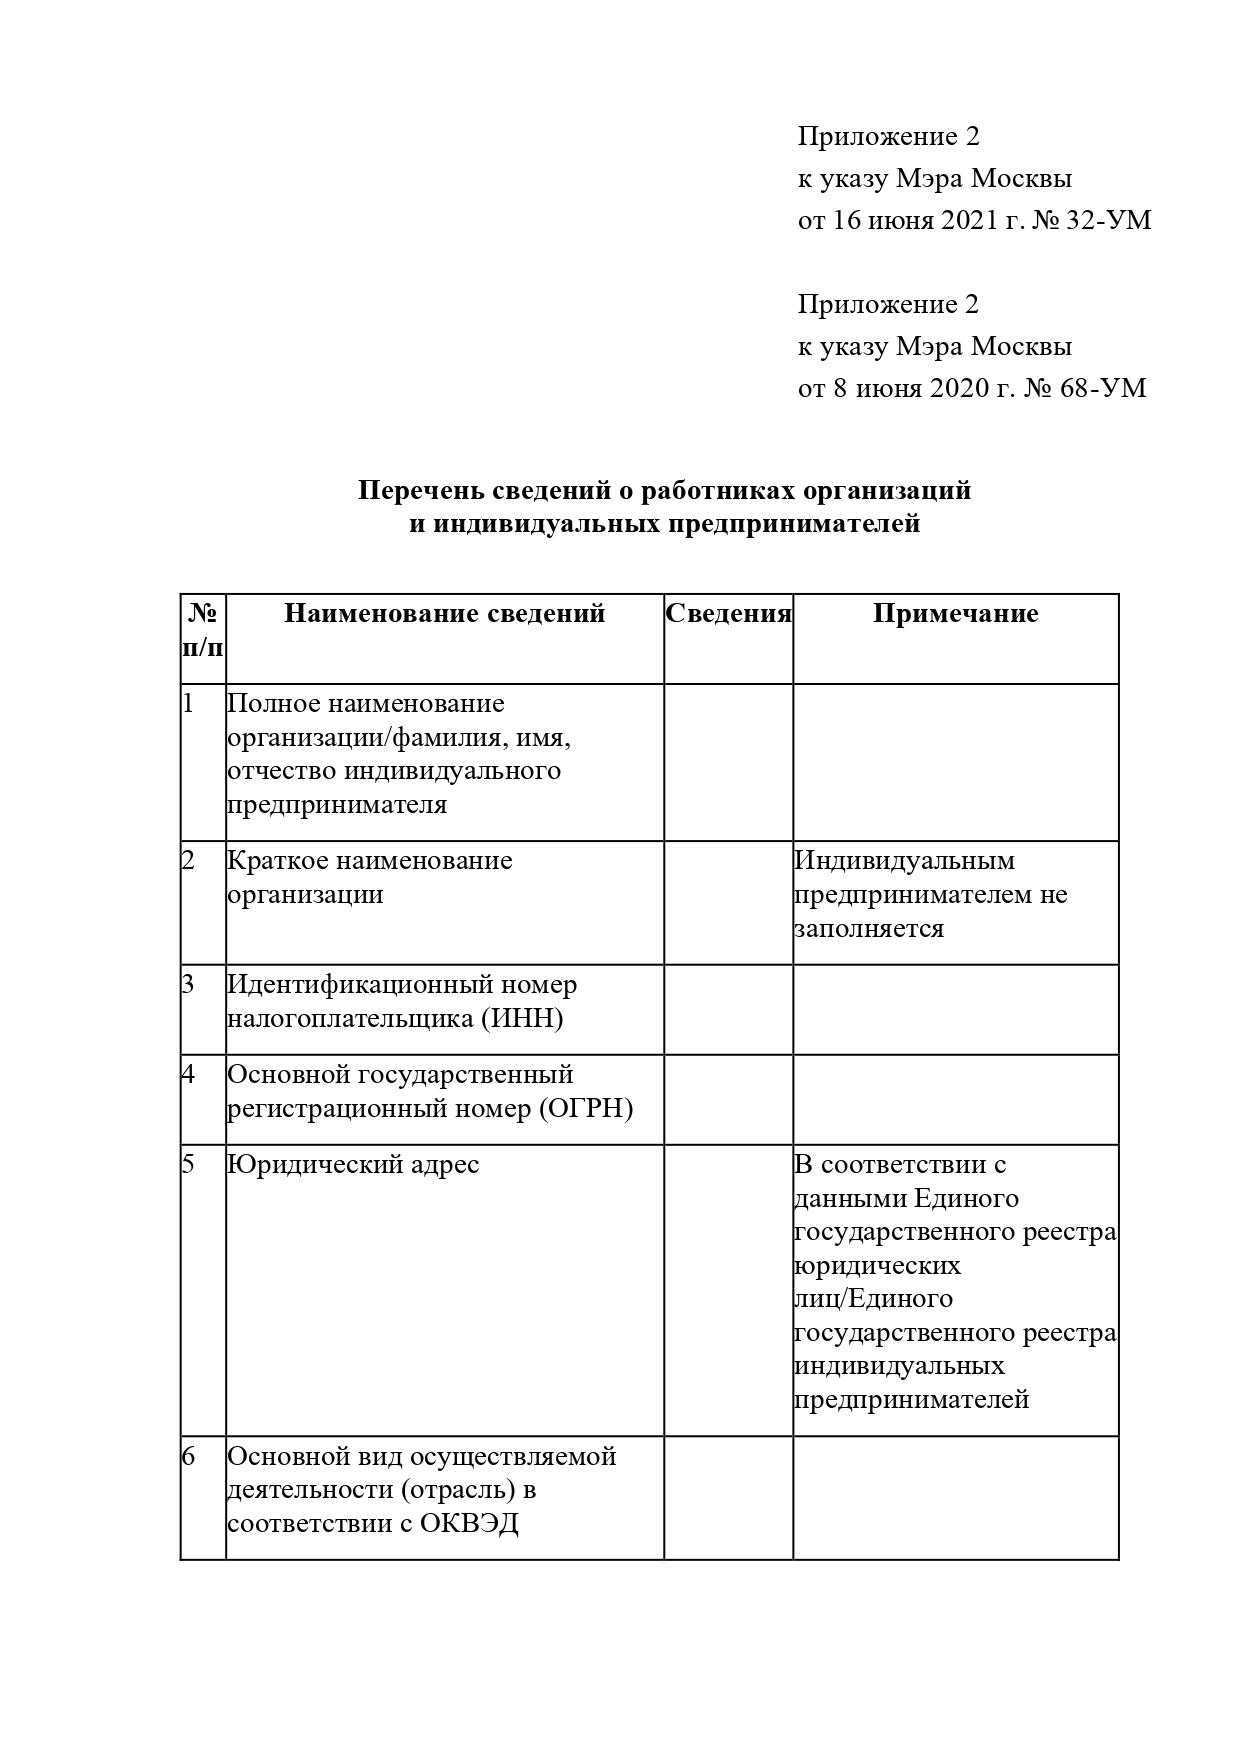 Указ Мэра Москвы N 32-УМ от 16.06.2021 об обязательной вакцинации от коронавируса - 4